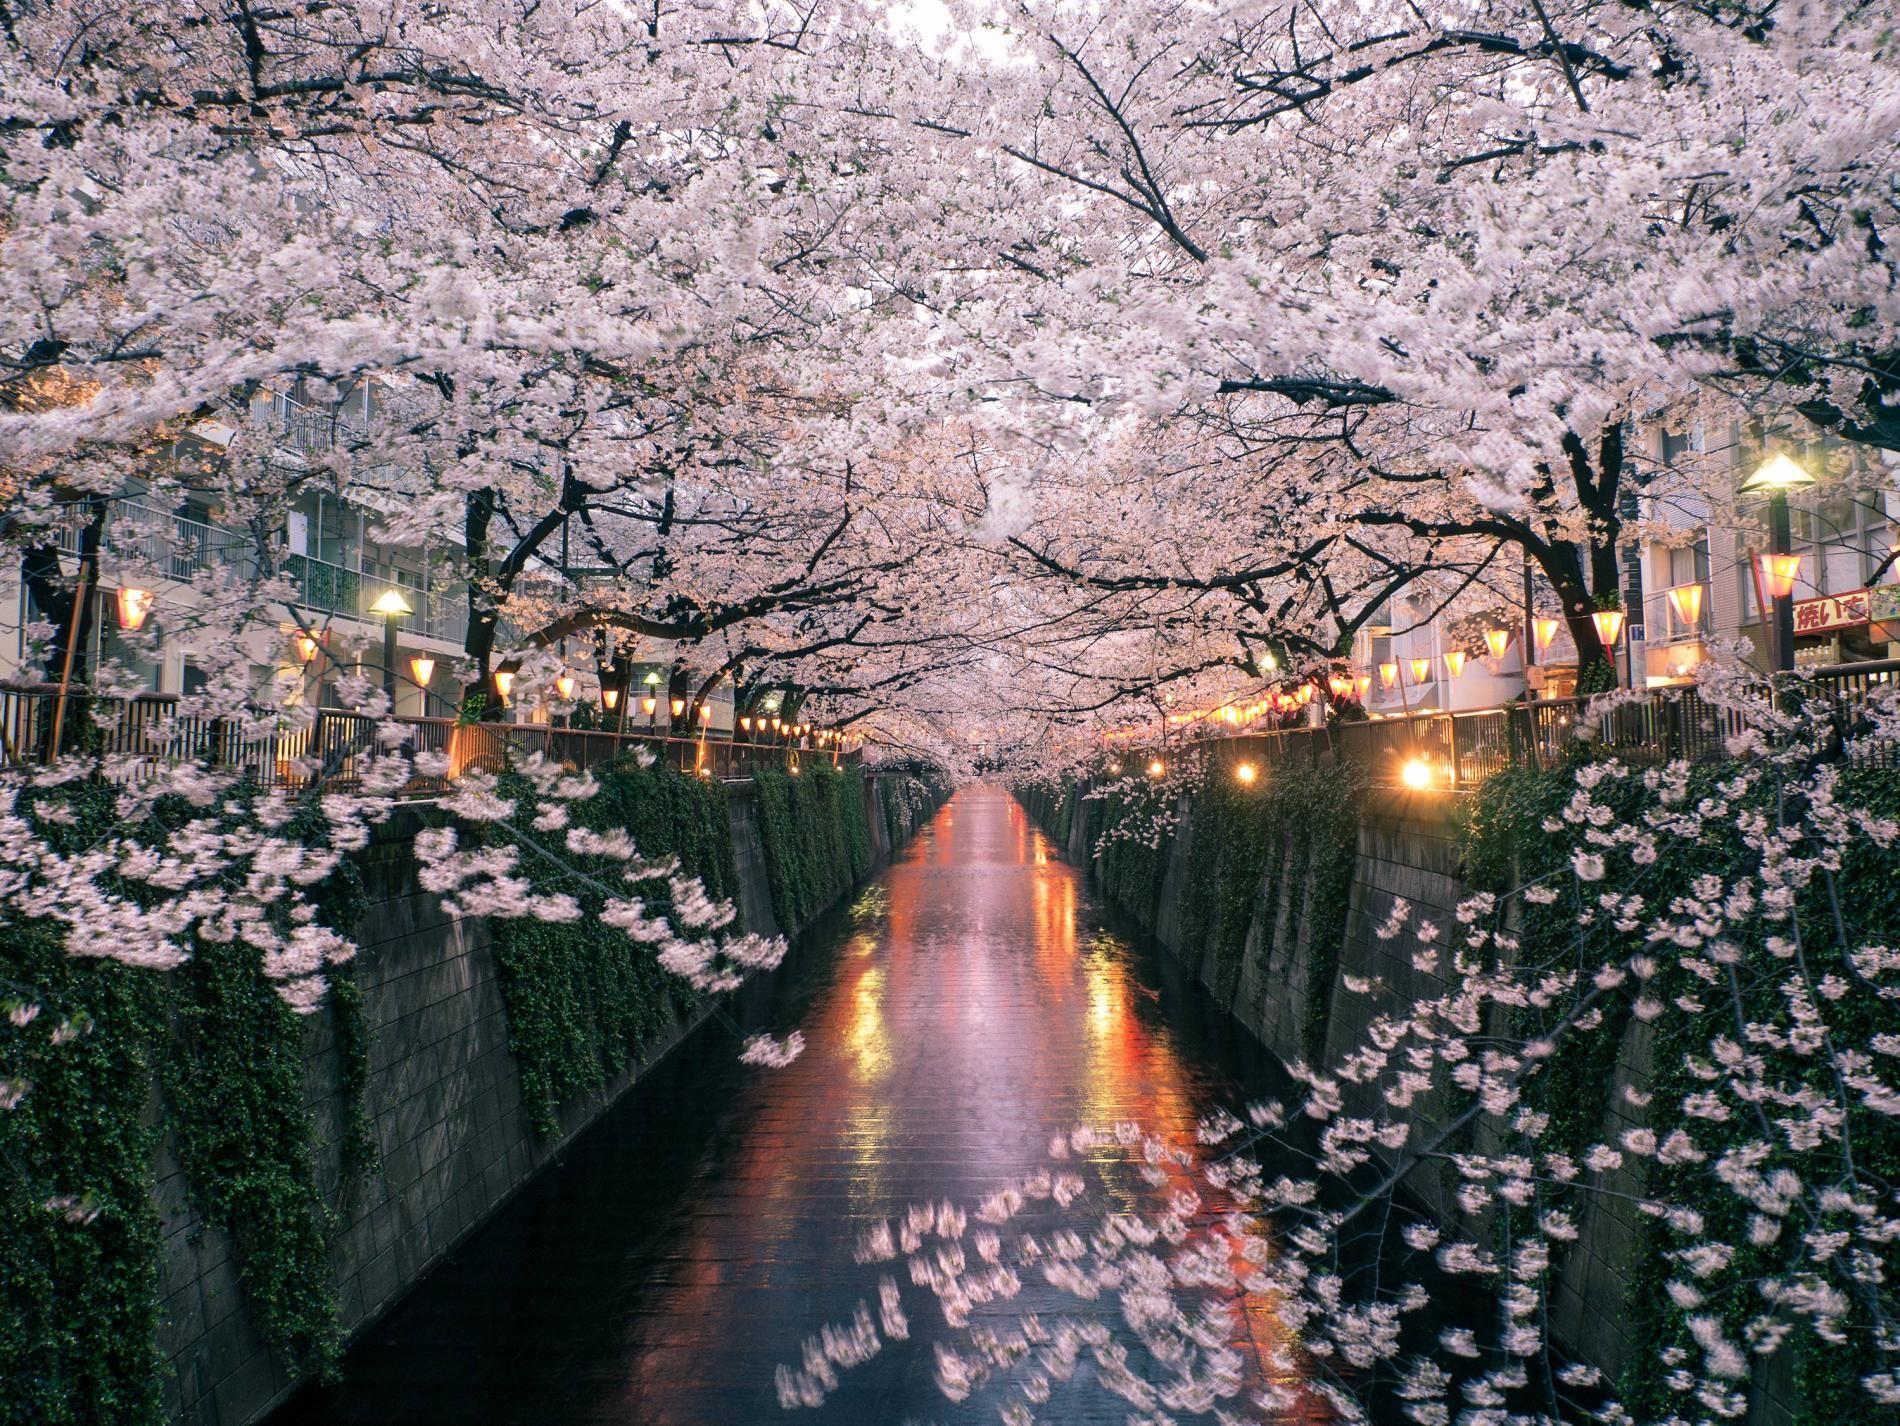 Best Spring Trips 2018 Cherry Blossom Japan Japan Cherry Blossom Festival Cherry Blossom Festival